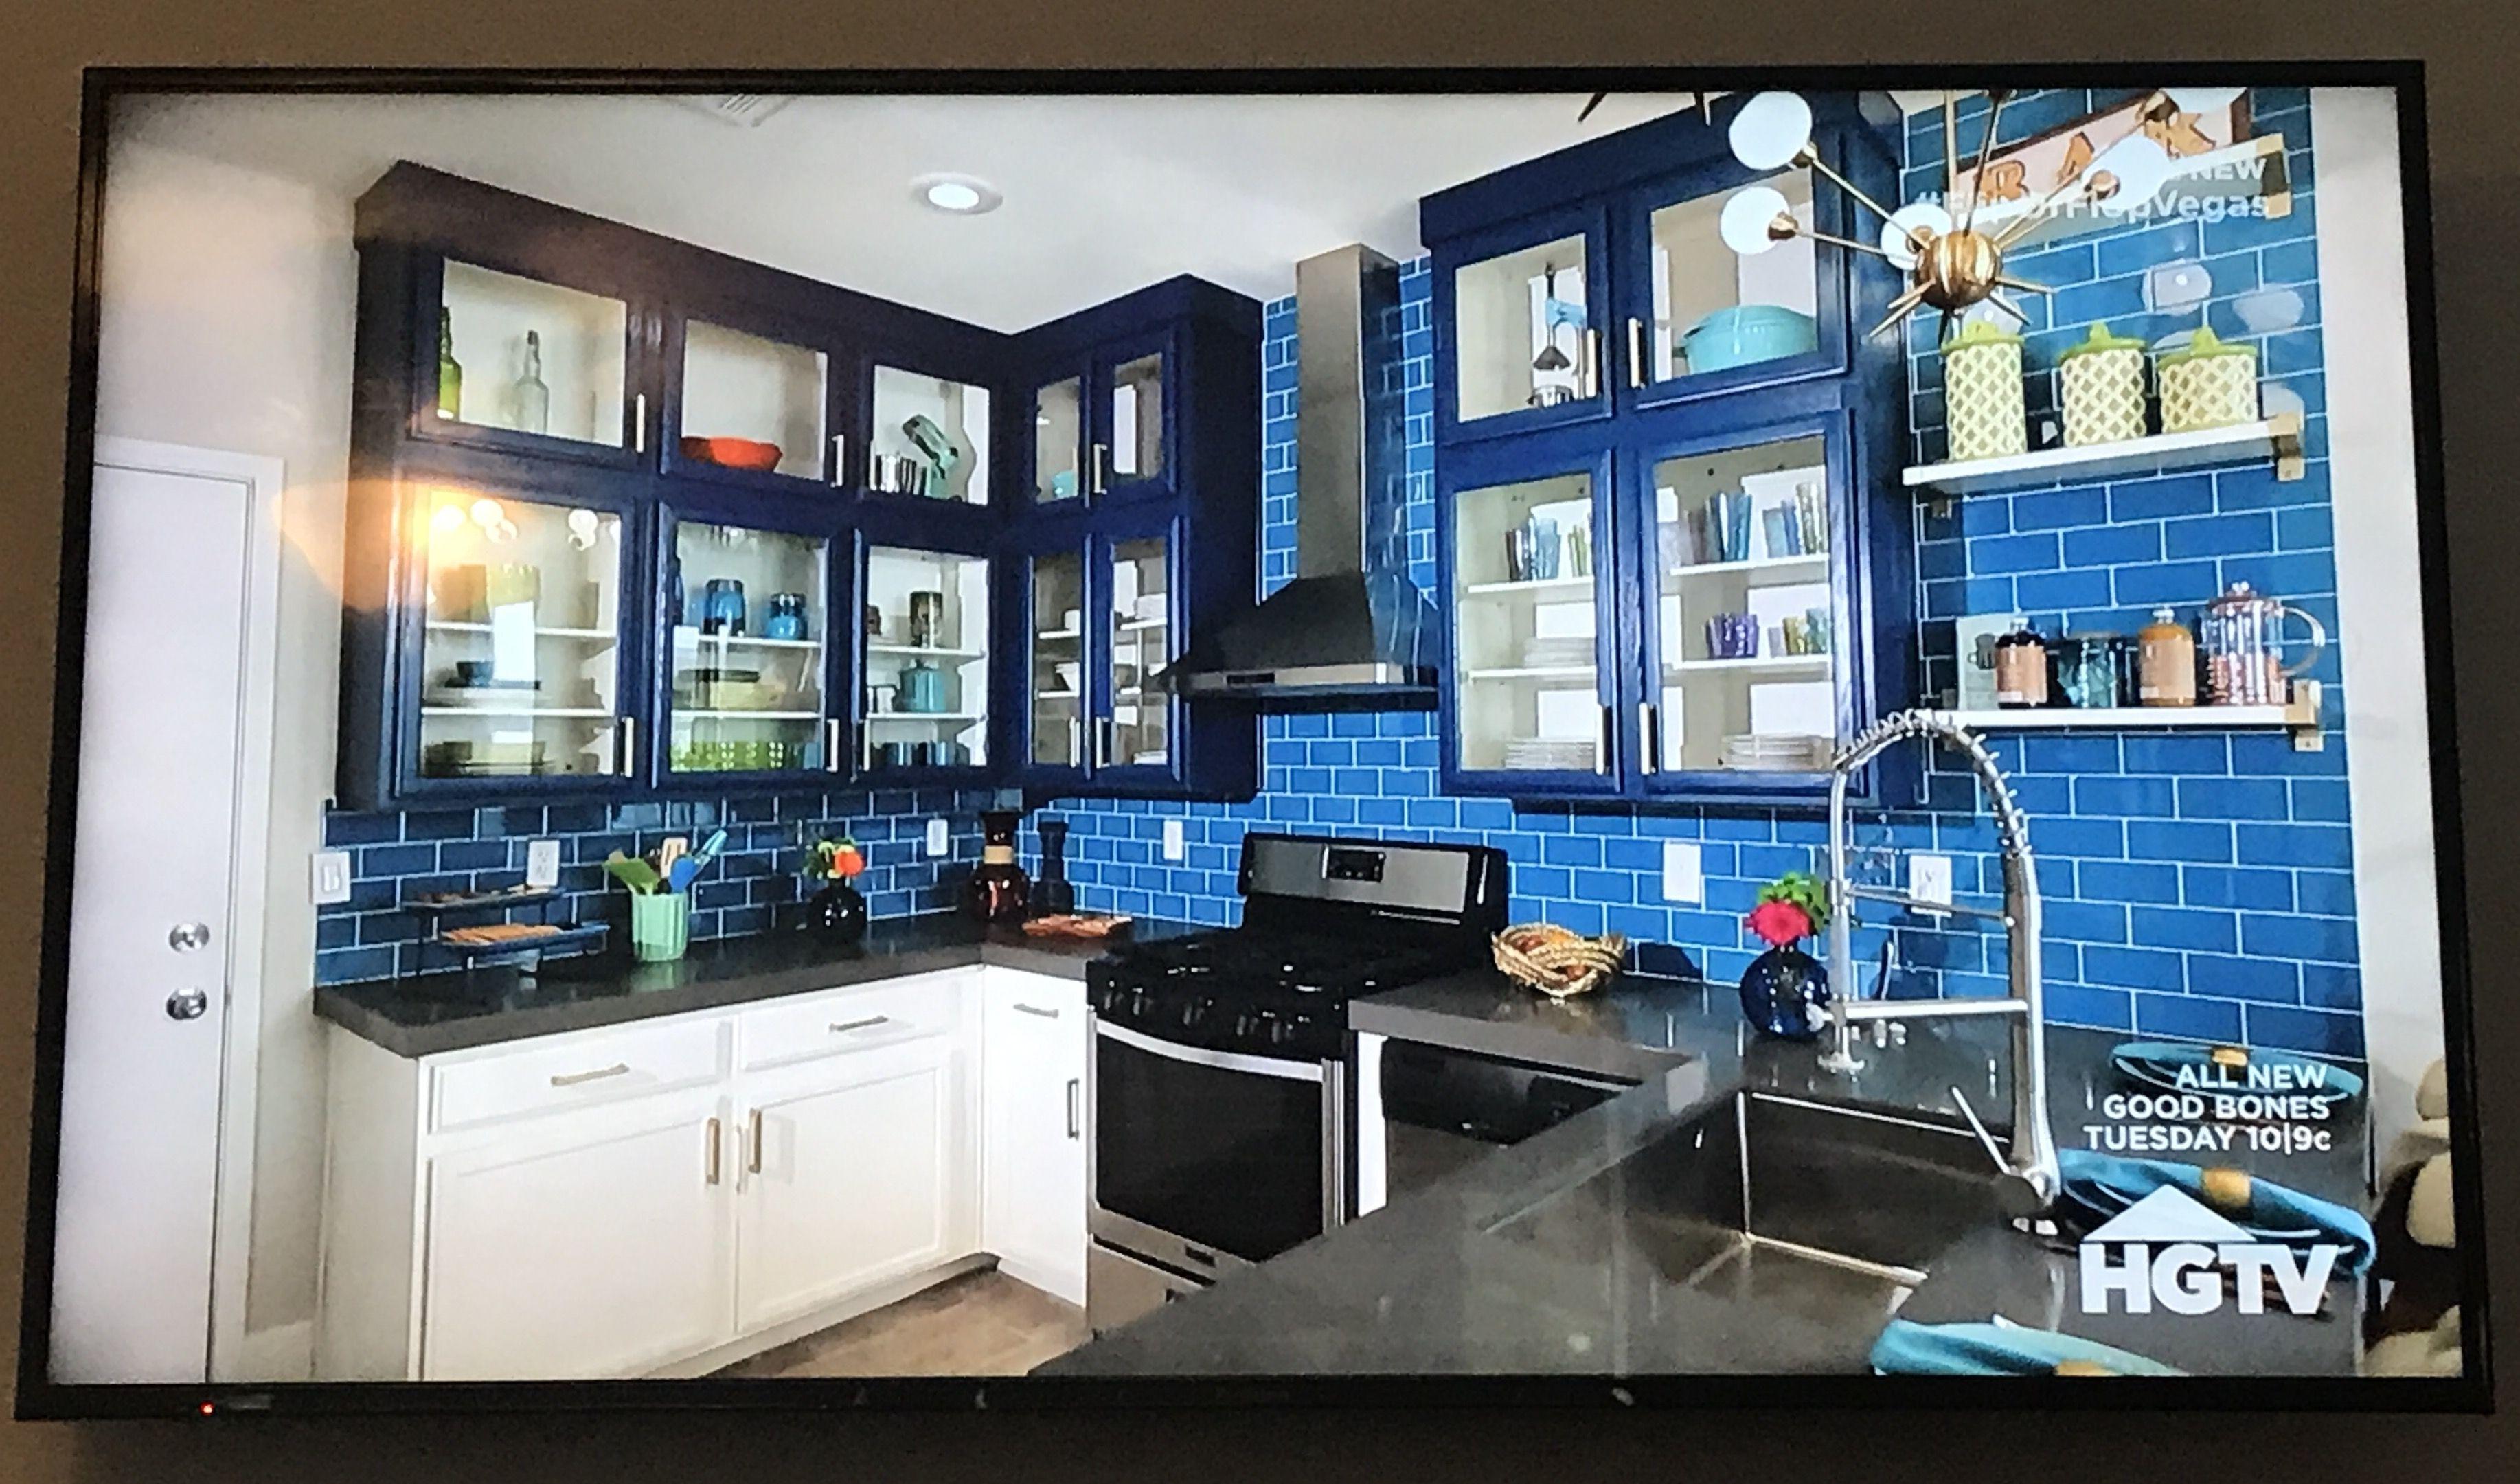 Flip or Flop Vegas Episode 8 kitchen | Future home | Pinterest ...